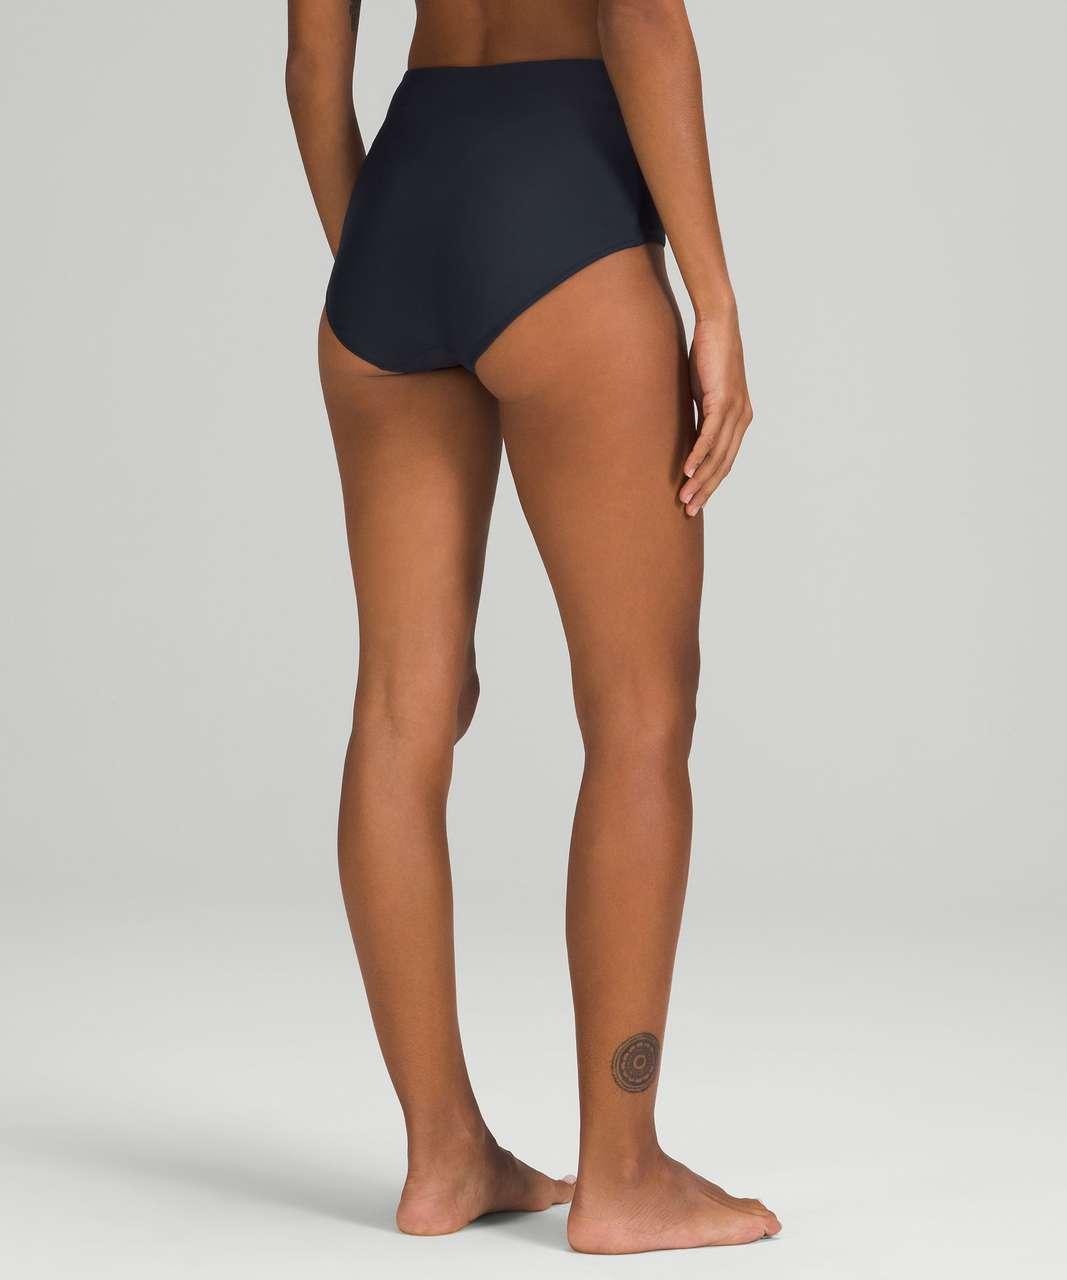 Lululemon Waterside High-Waisted Bikini Bottom *Medium Coverage - True Navy